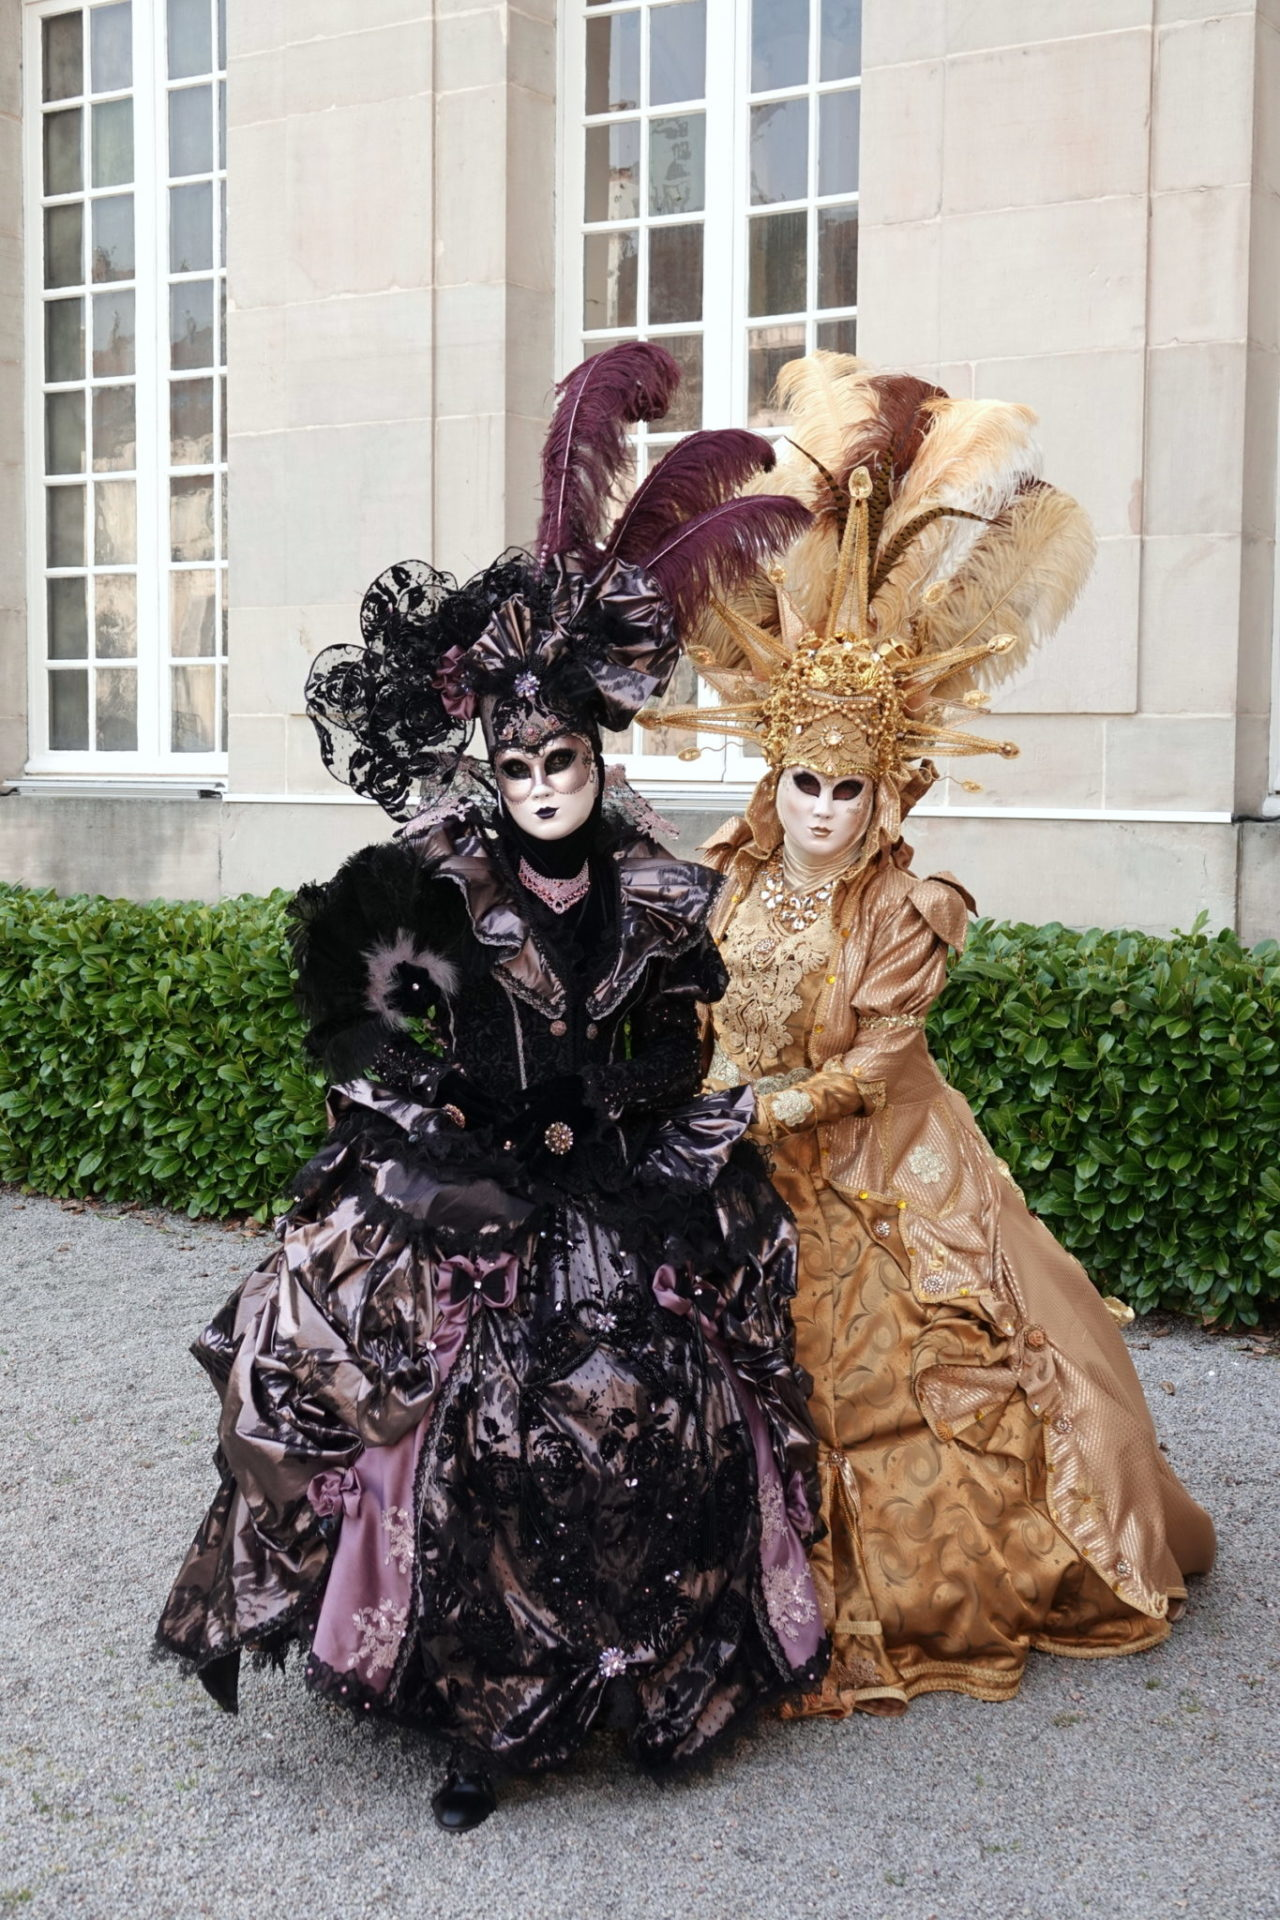 Les élégantes - Photo Ingrid et Arno Martini